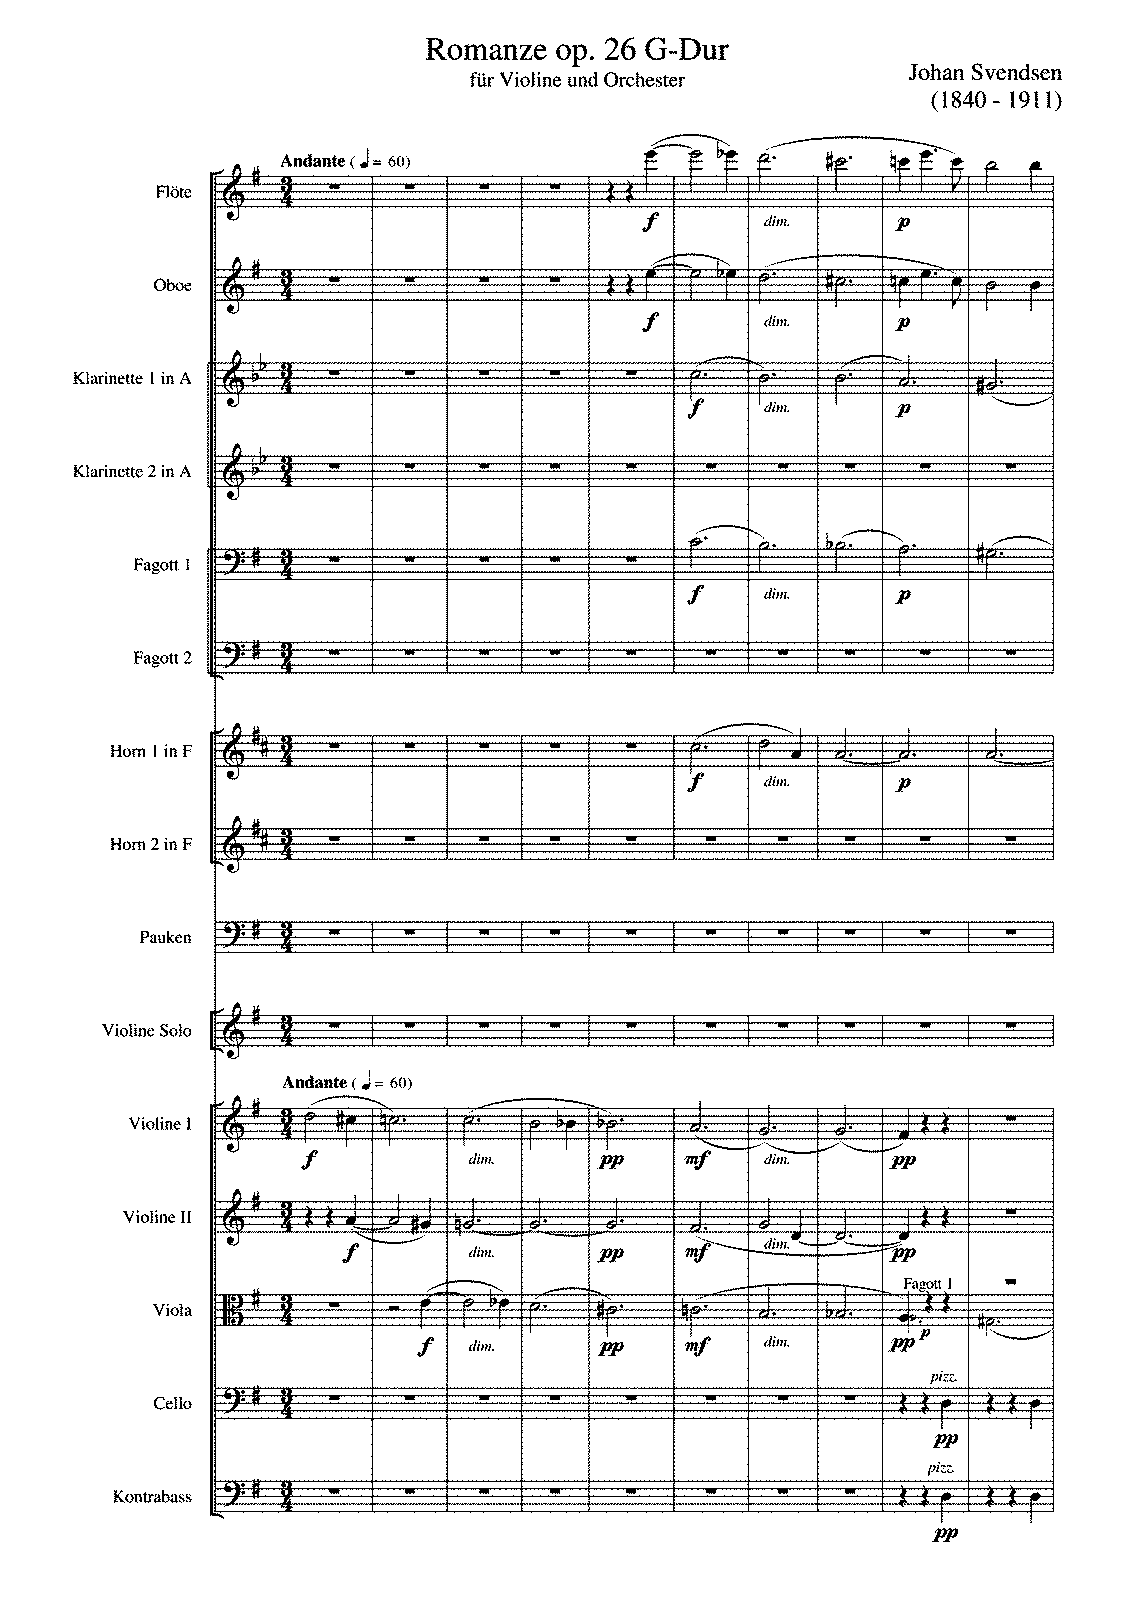 Op. 26